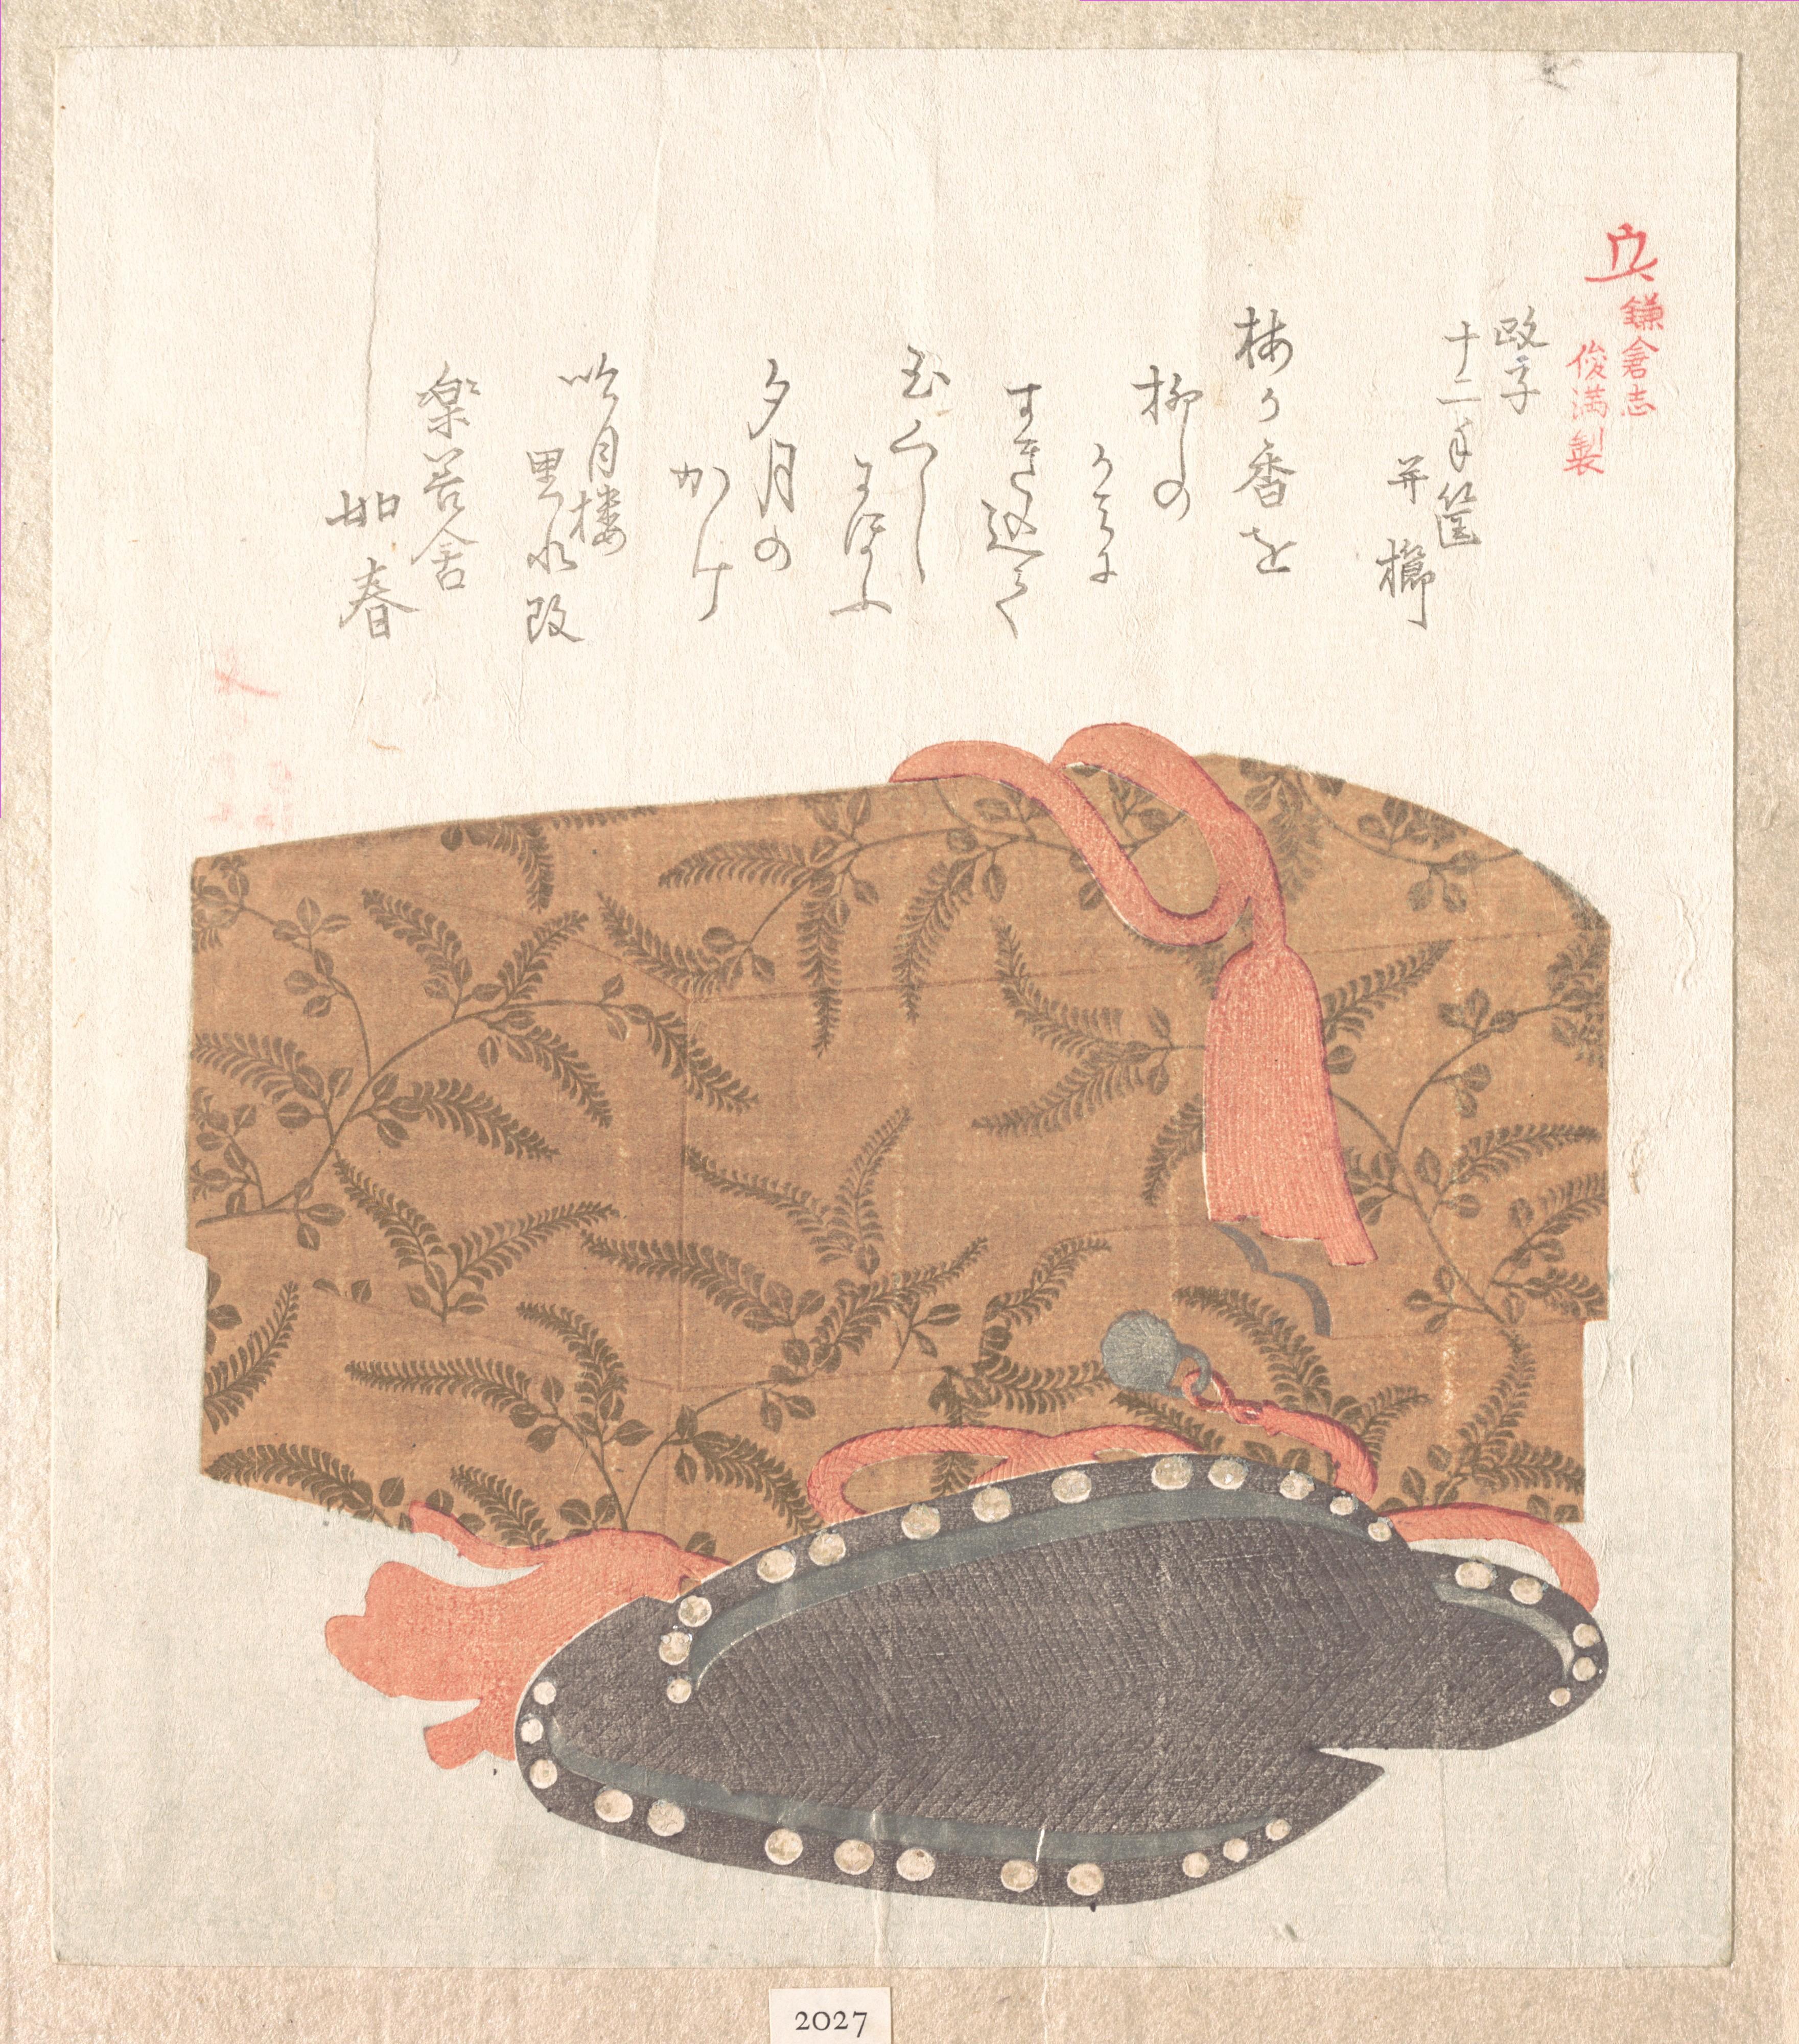 История Камакура_210х184 мм